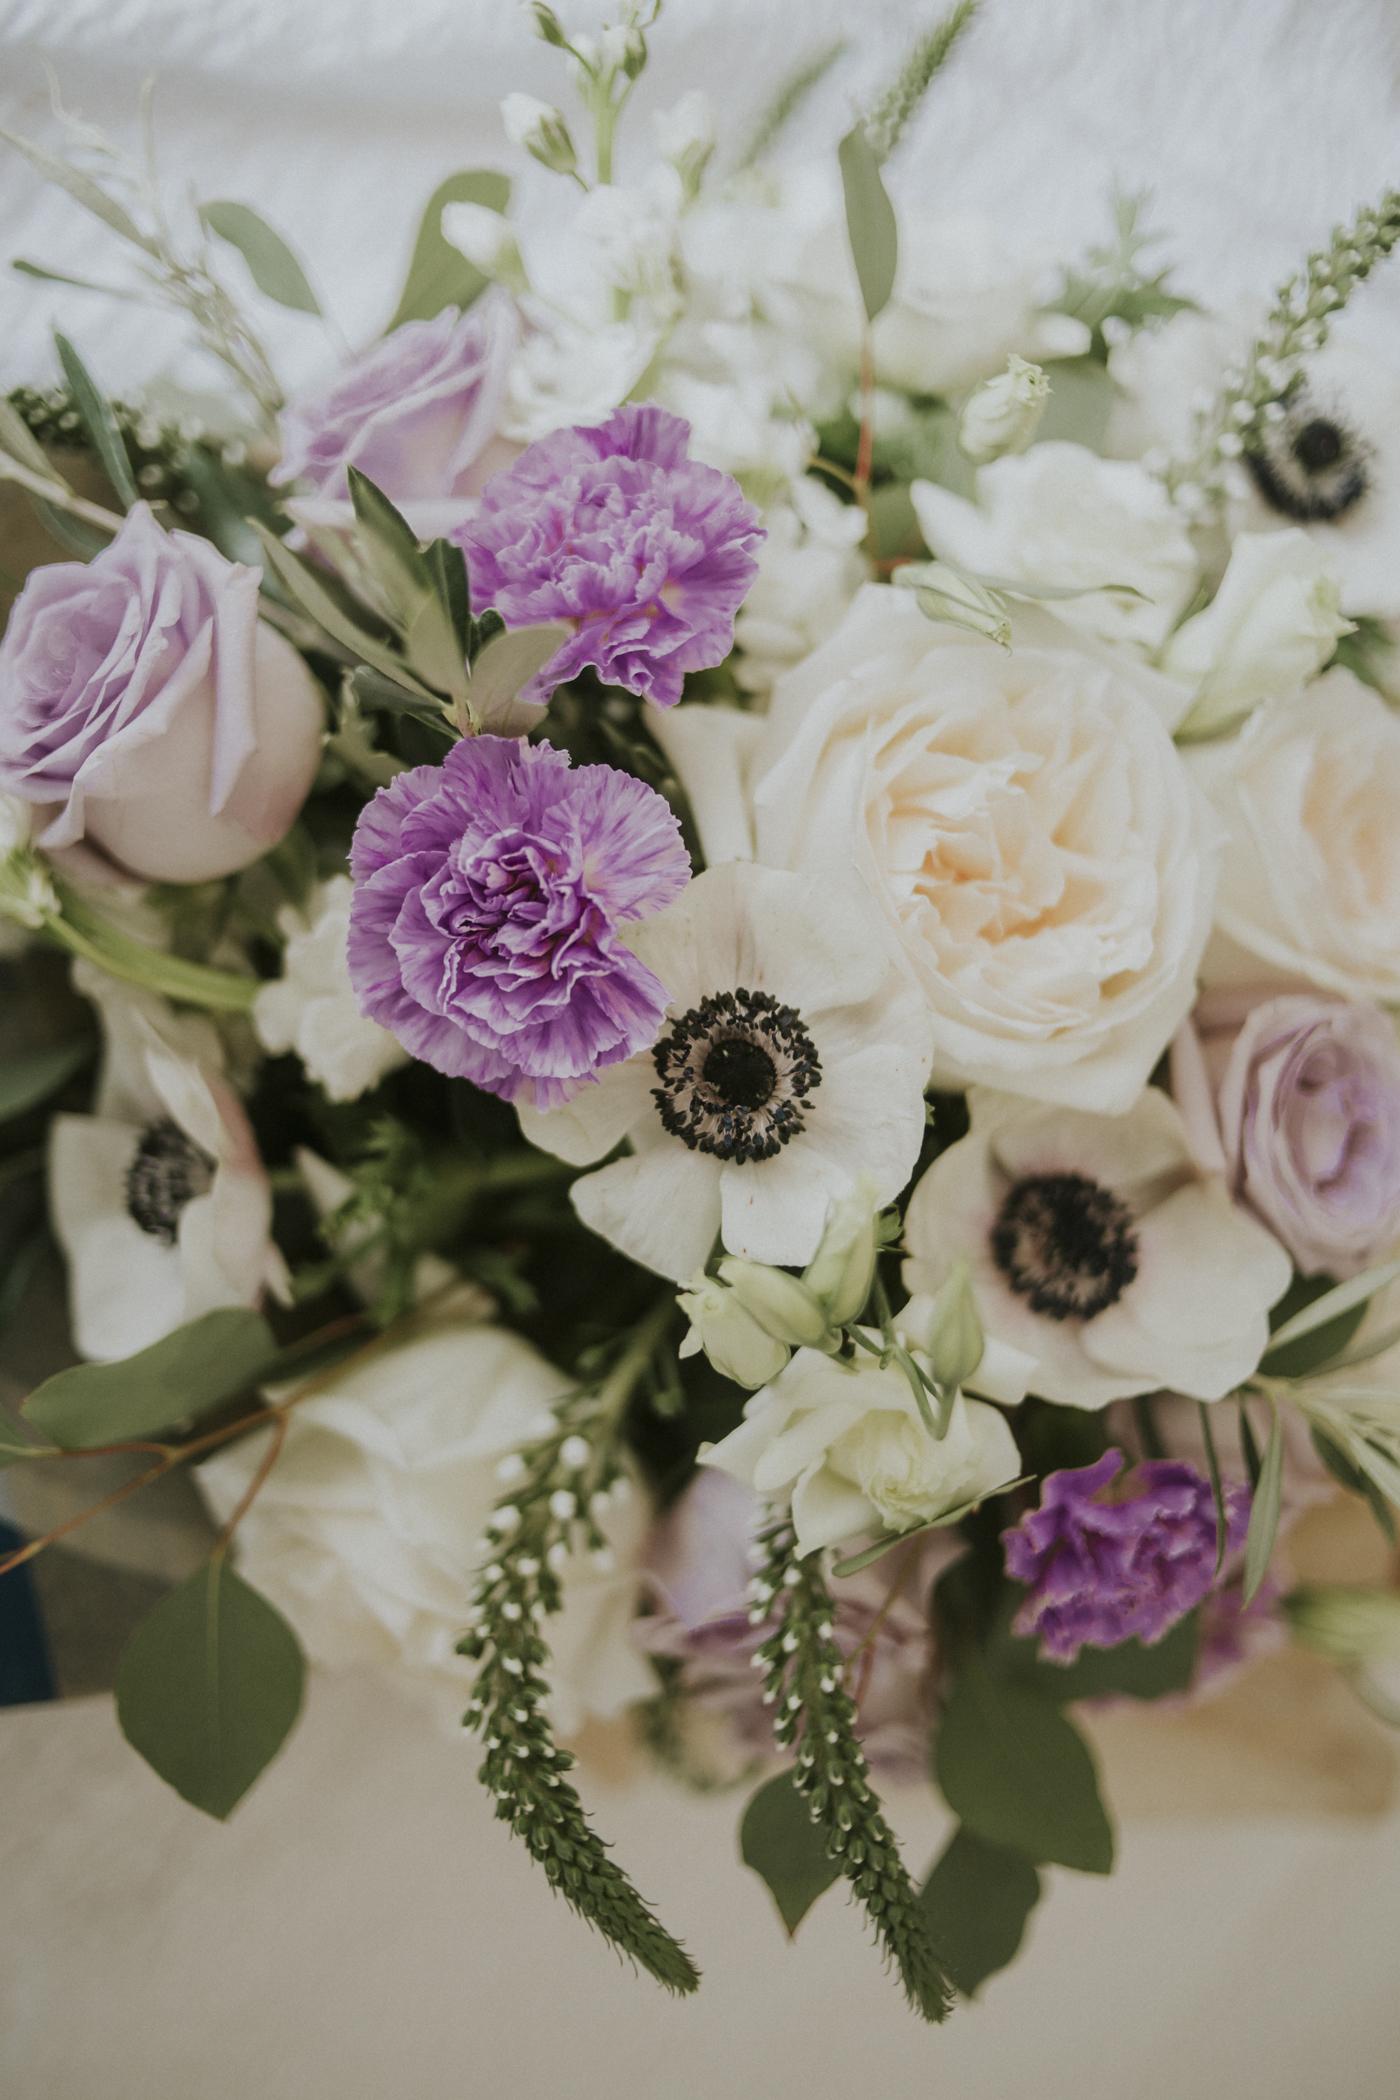 Floral Design by the Secret Garden - Kaylen and Eric's Romantic Countryside Wedding in Cincinnati, Ohio